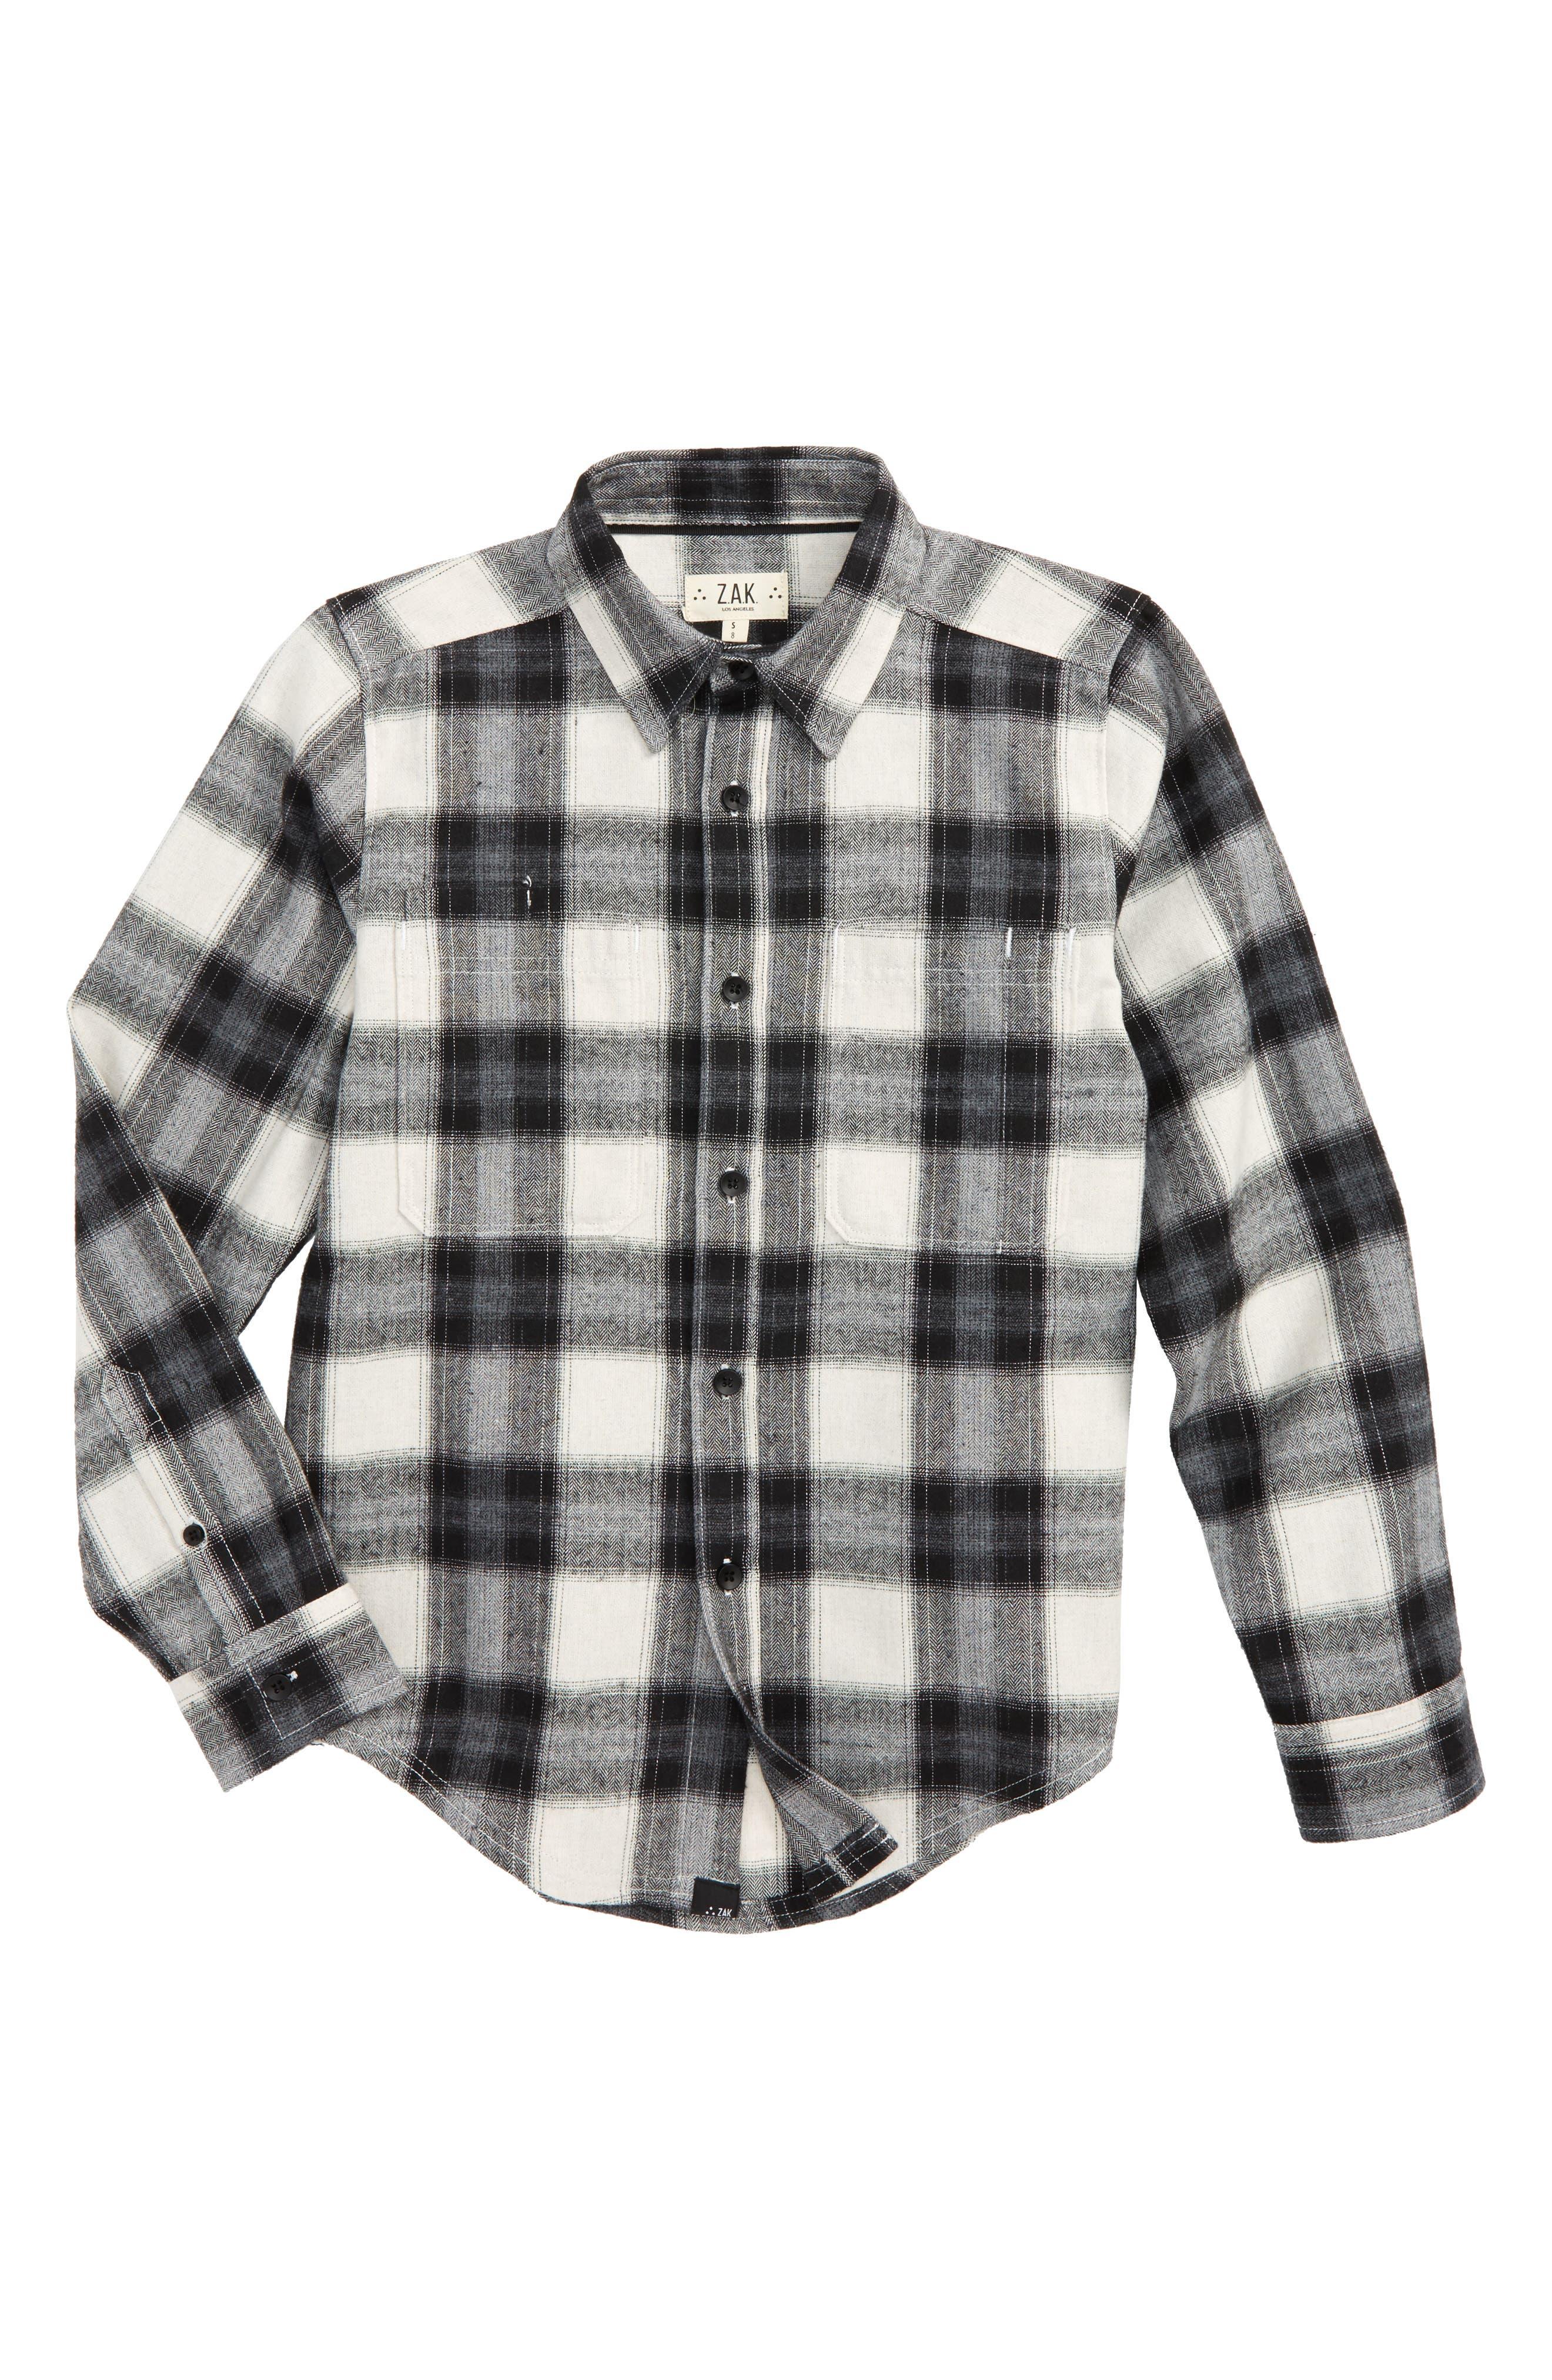 Z.A.K. Brand Woven Flannel Shirt (Big Boys)